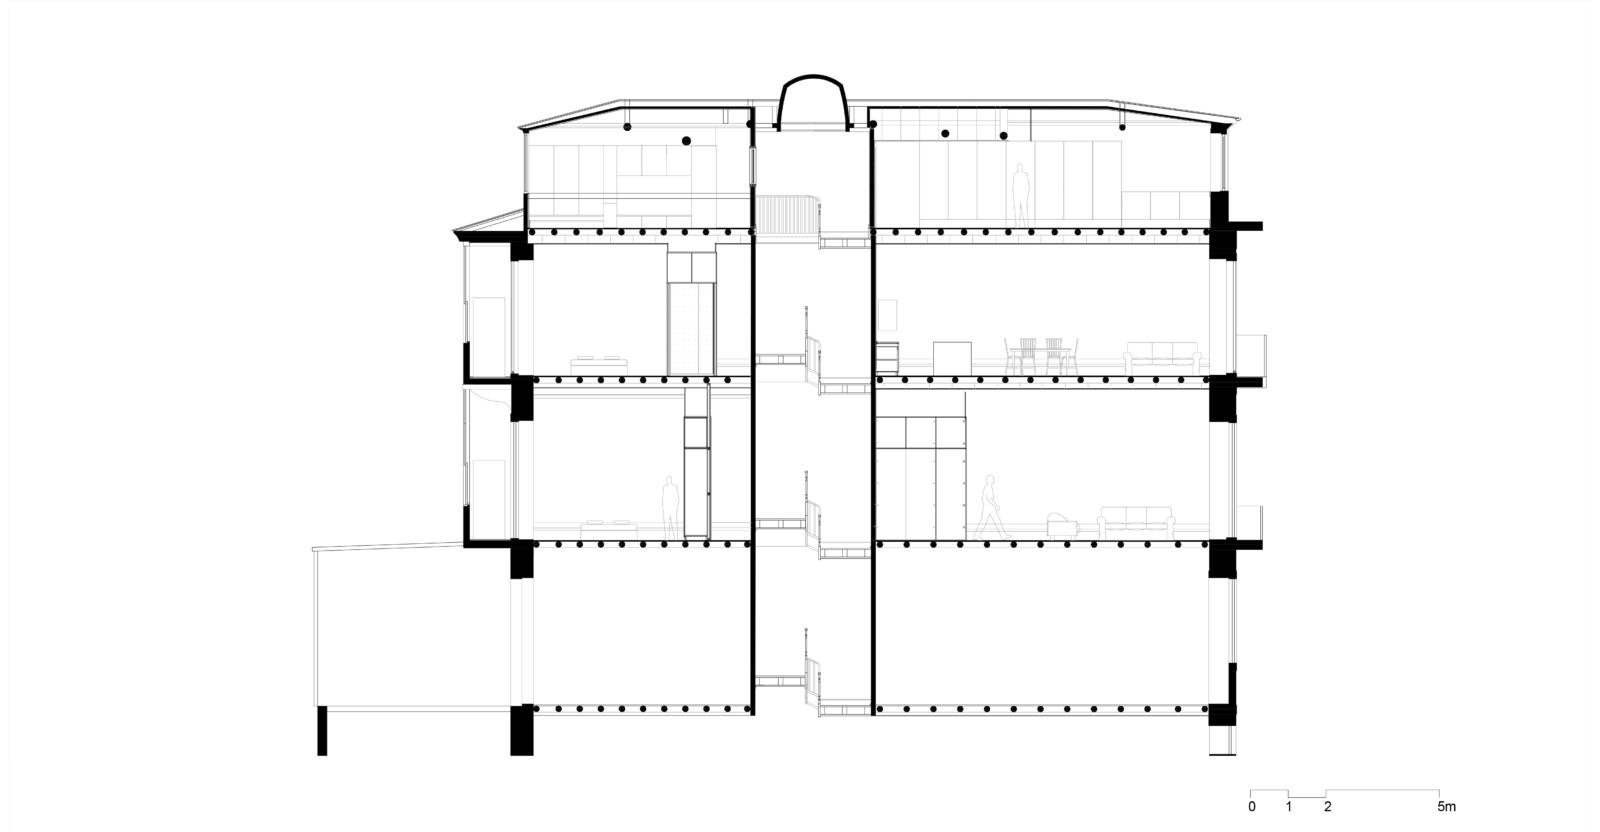 Corte longitudinal 1